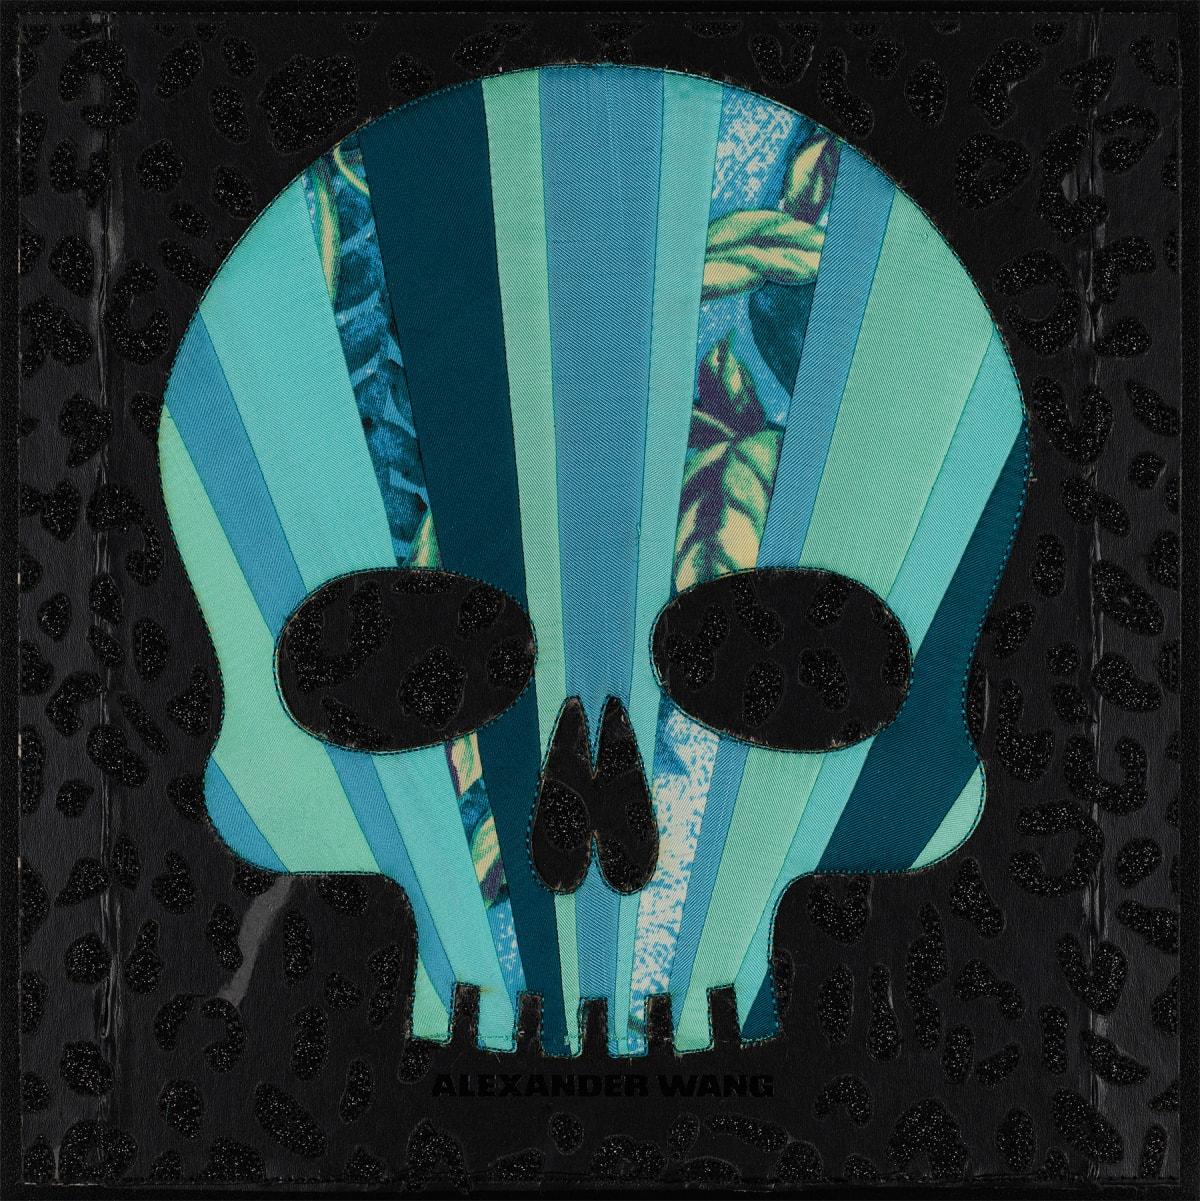 Stephen Wilson, A.W. Skull (Teal), 2019